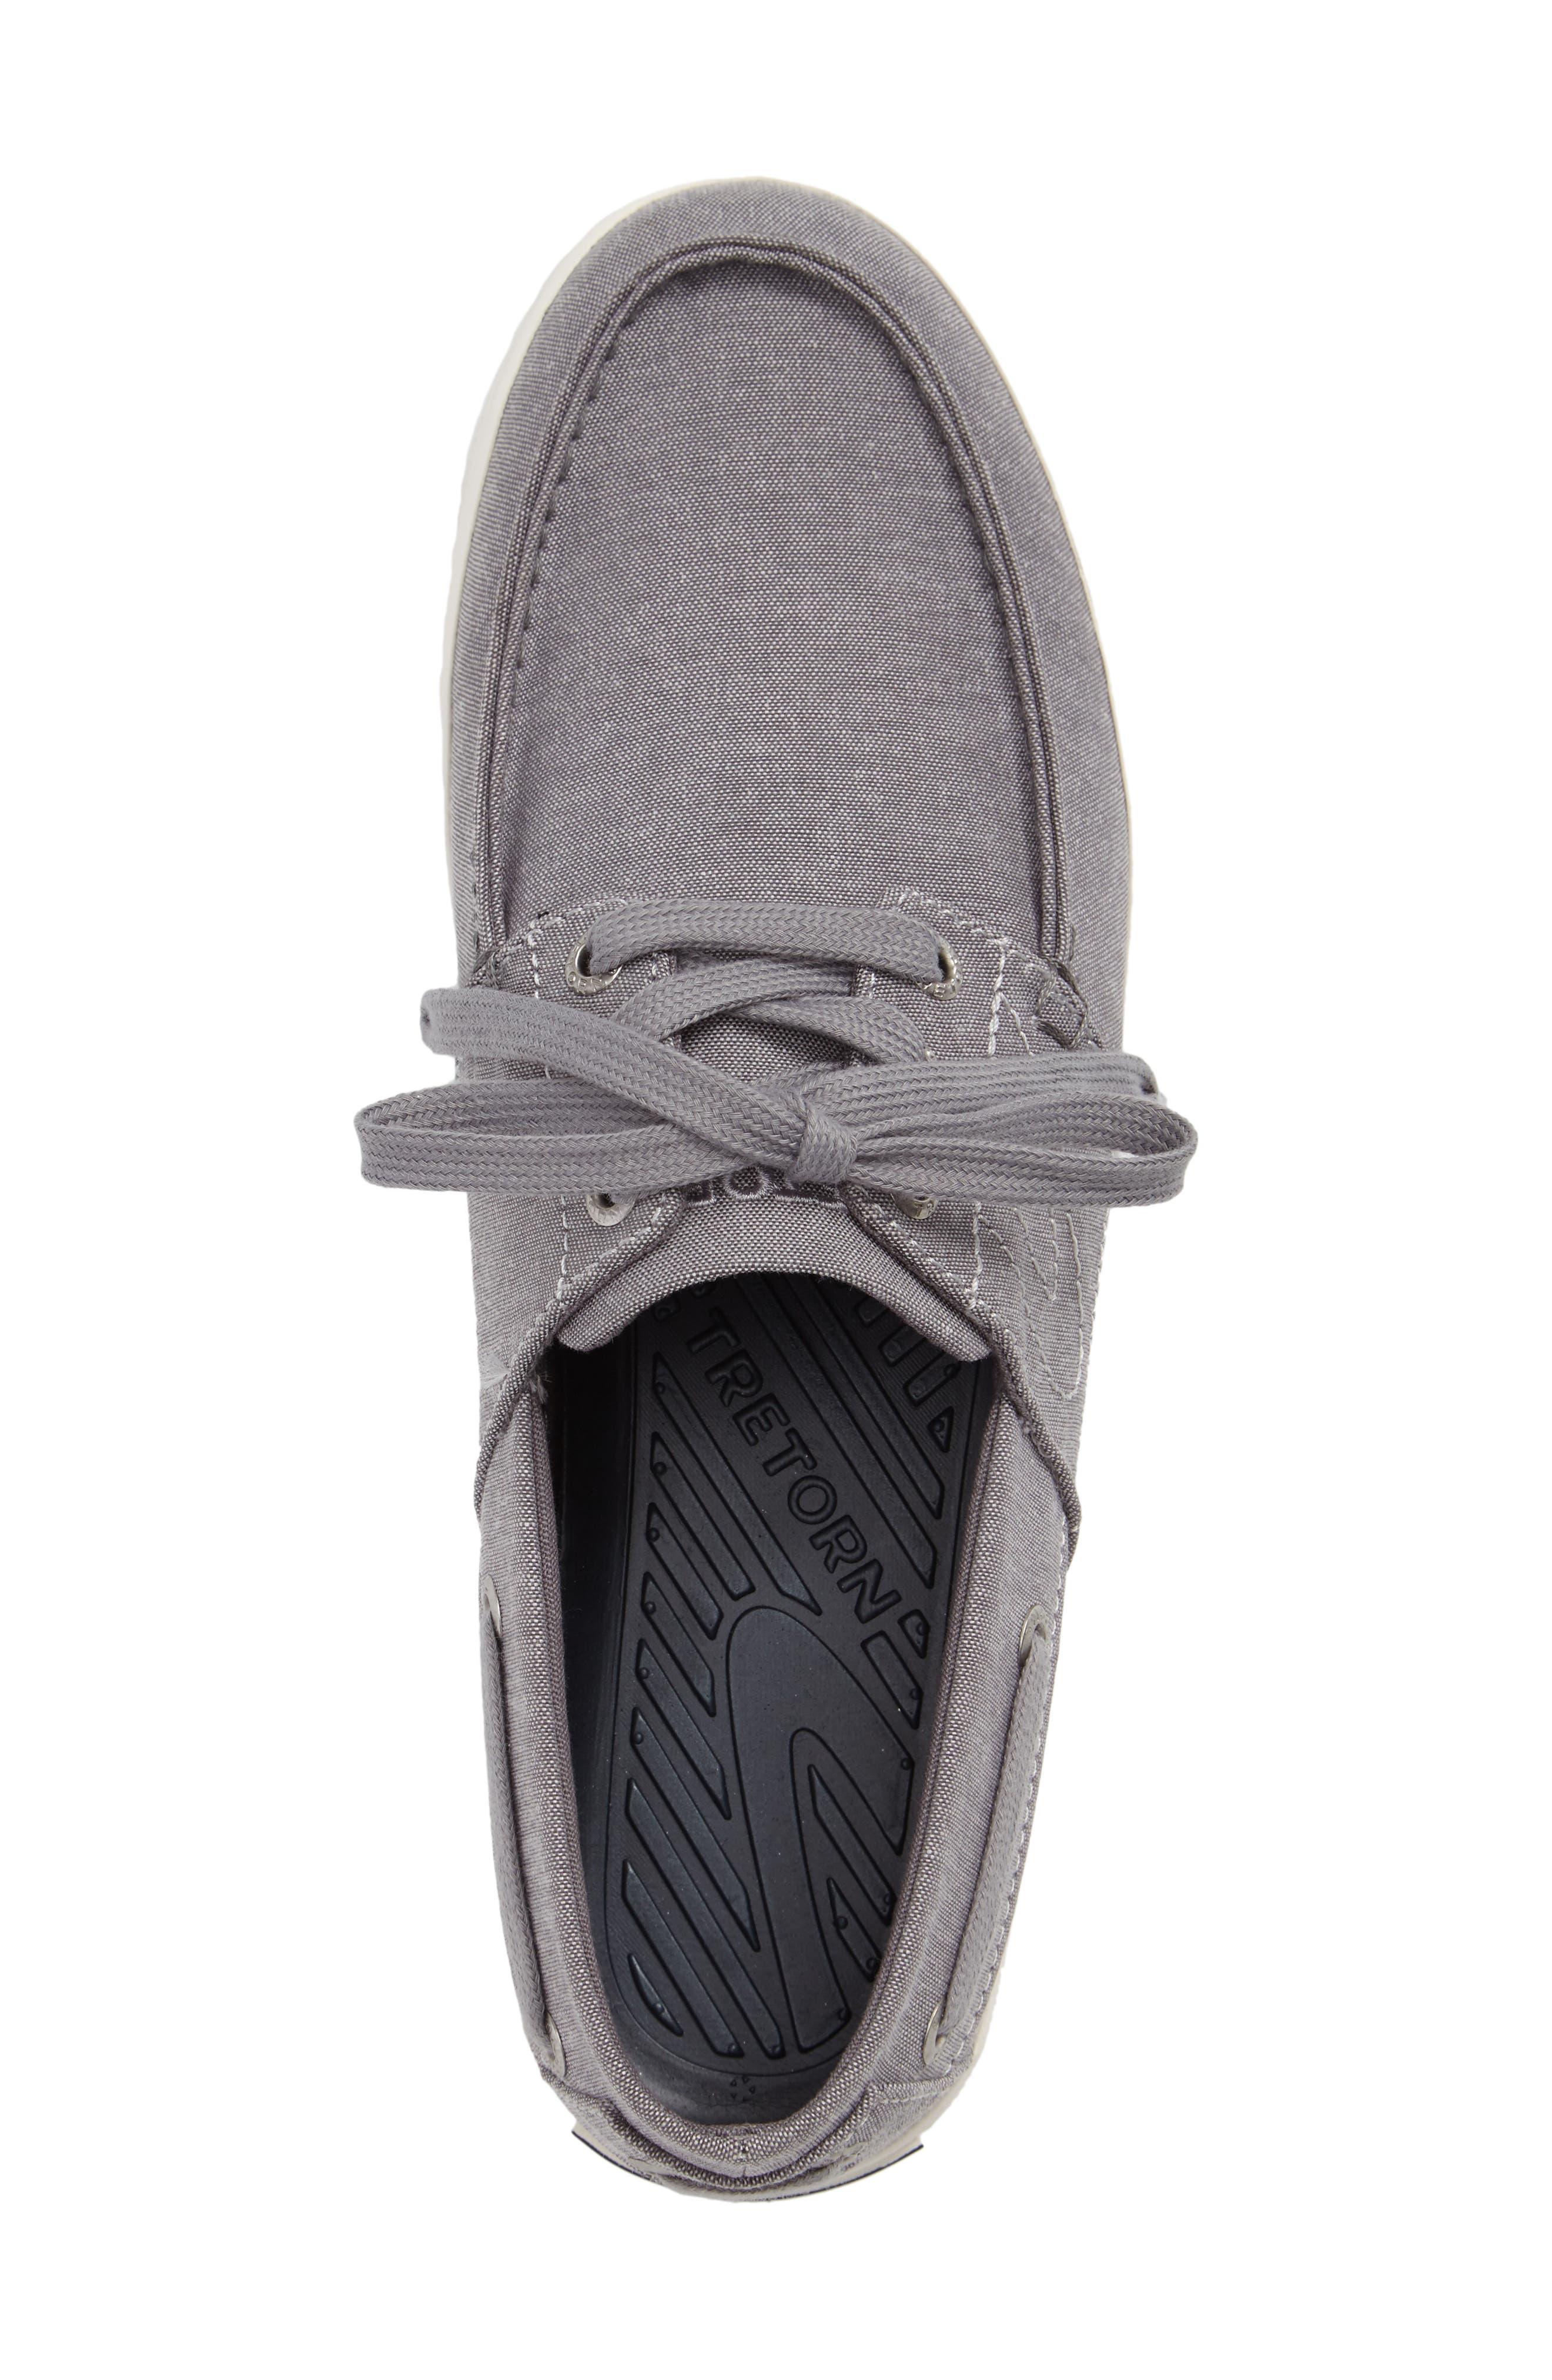 Motto Boat Shoe,                             Alternate thumbnail 3, color,                             GREY CHAMBRAY CANVAS